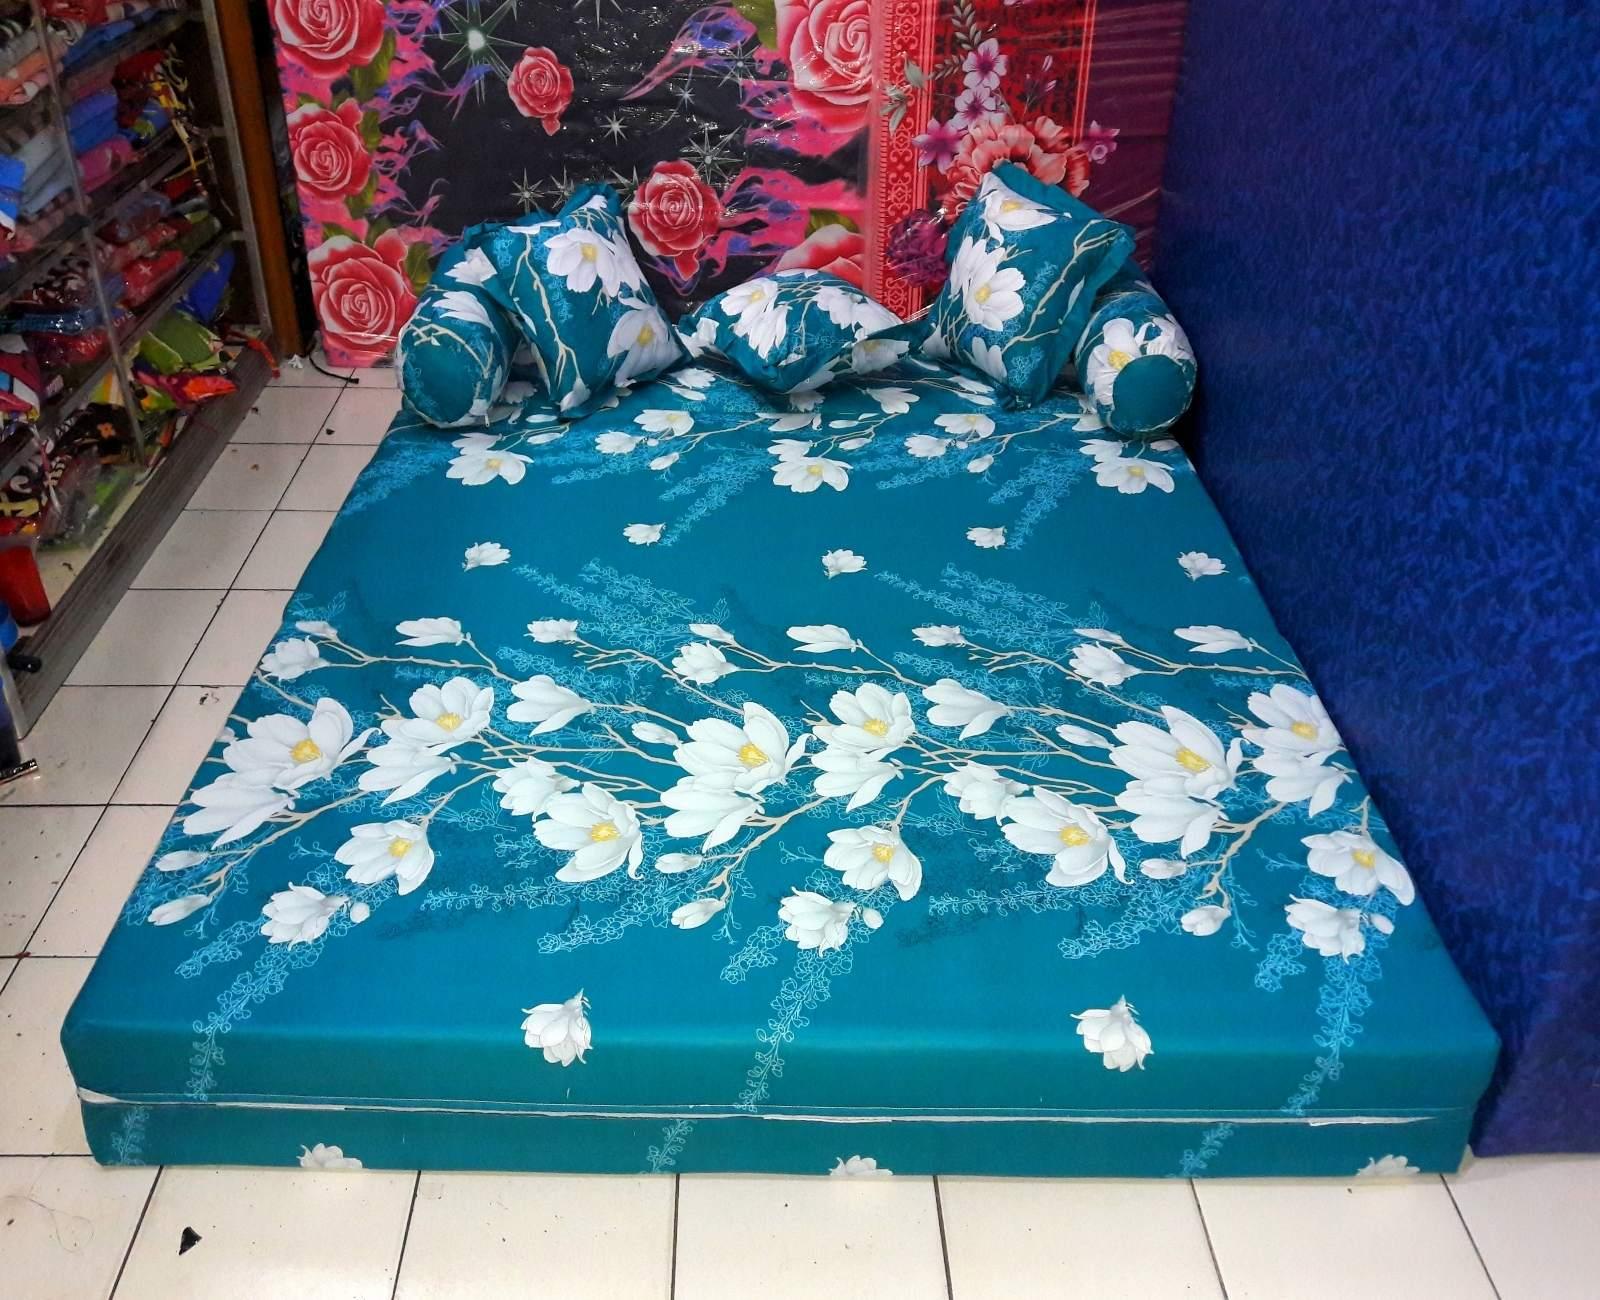 Sofa Bed Inoac 3 In 1 Piece Sectional For Cheap 2018 Full Motif Agen Resmi Kasur Busa